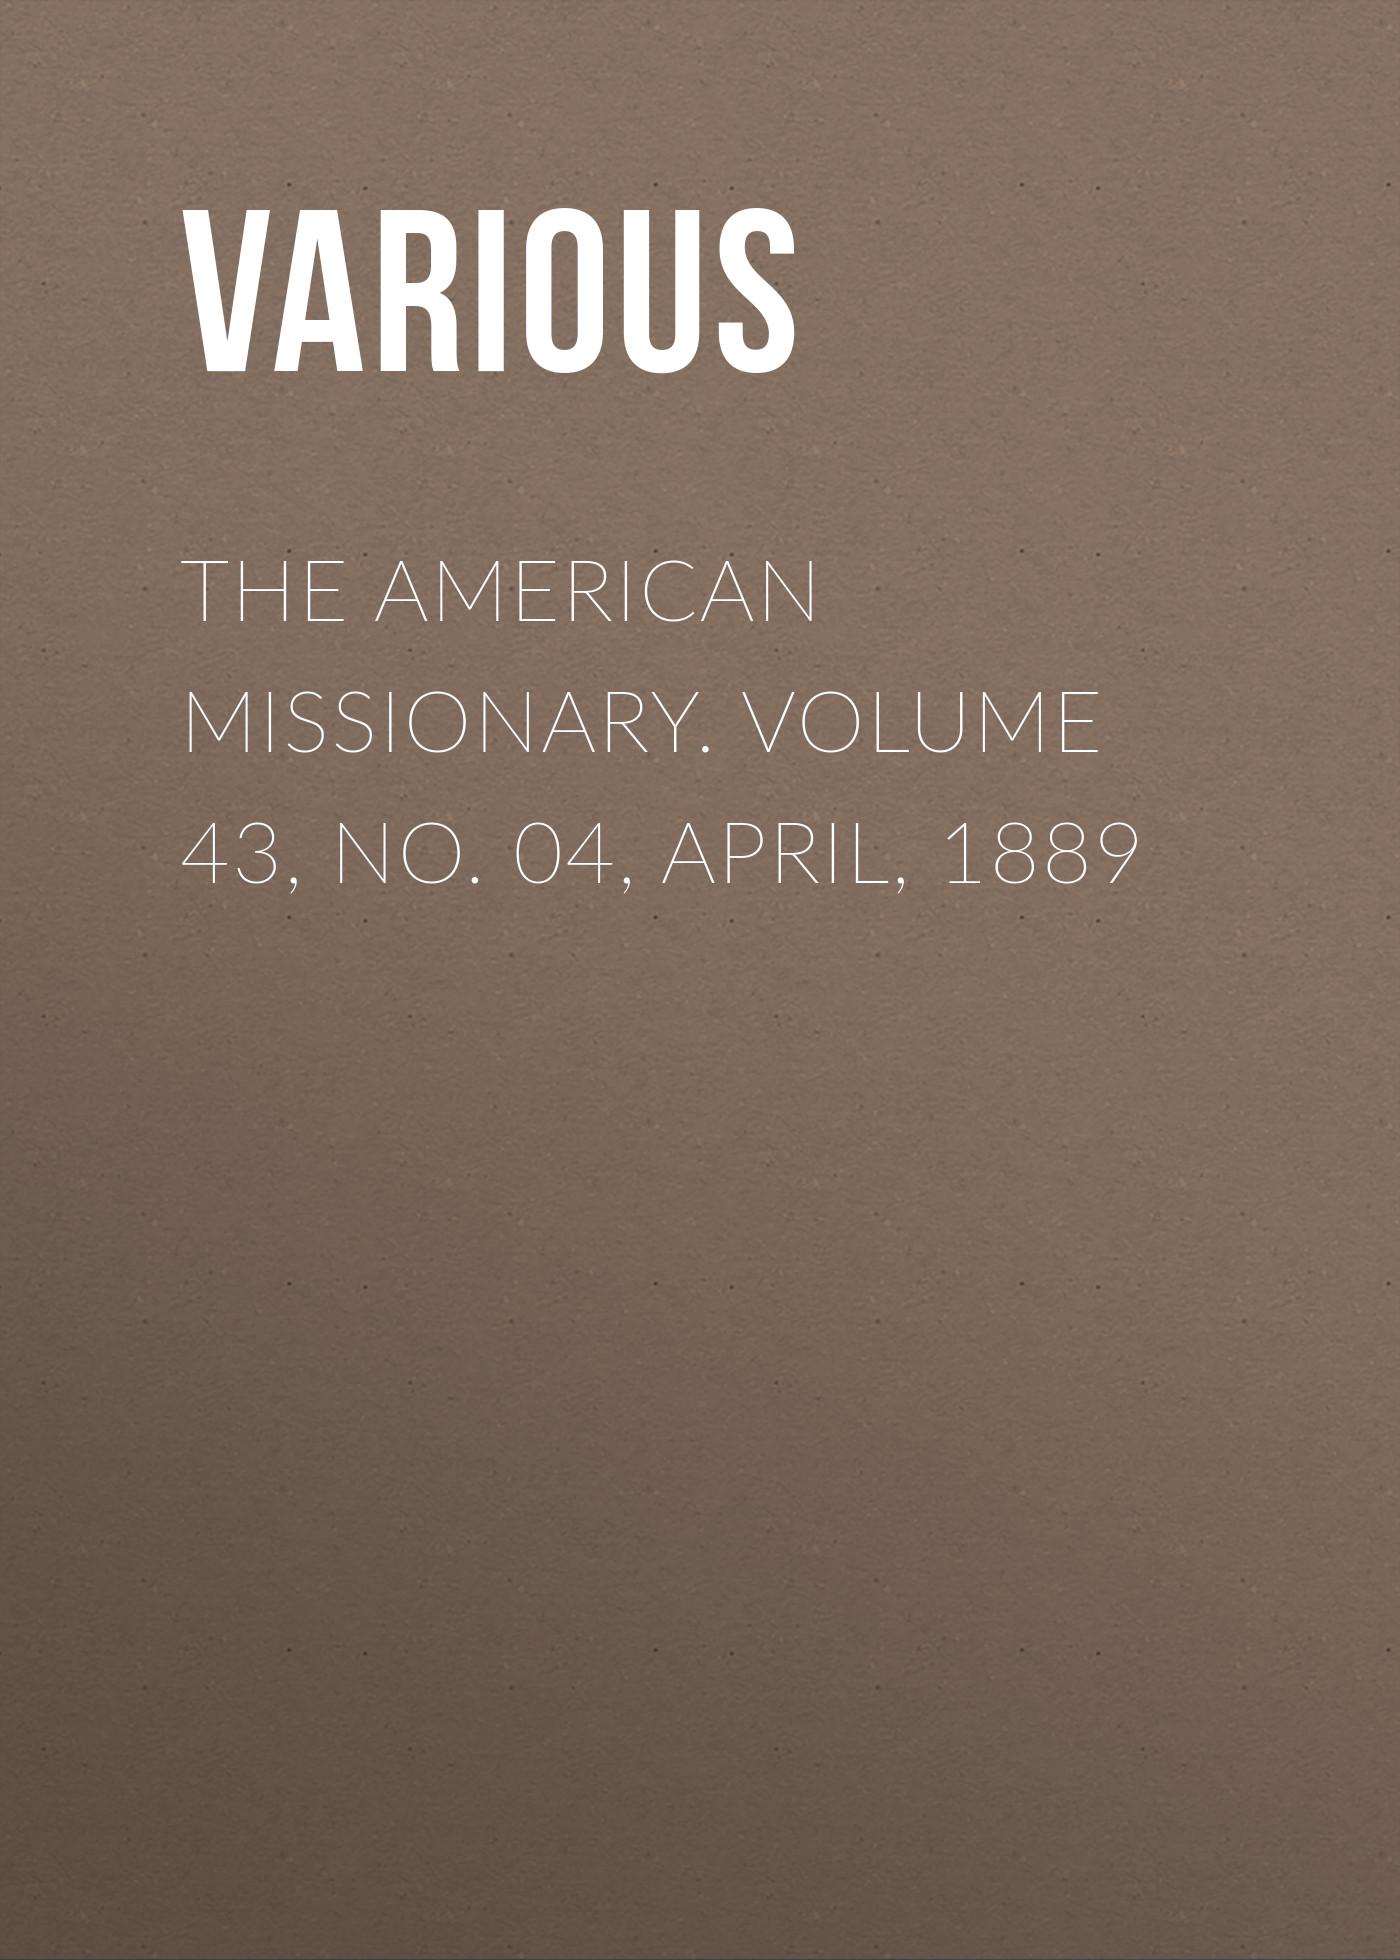 лучшая цена Various The American Missionary. Volume 43, No. 04, April, 1889